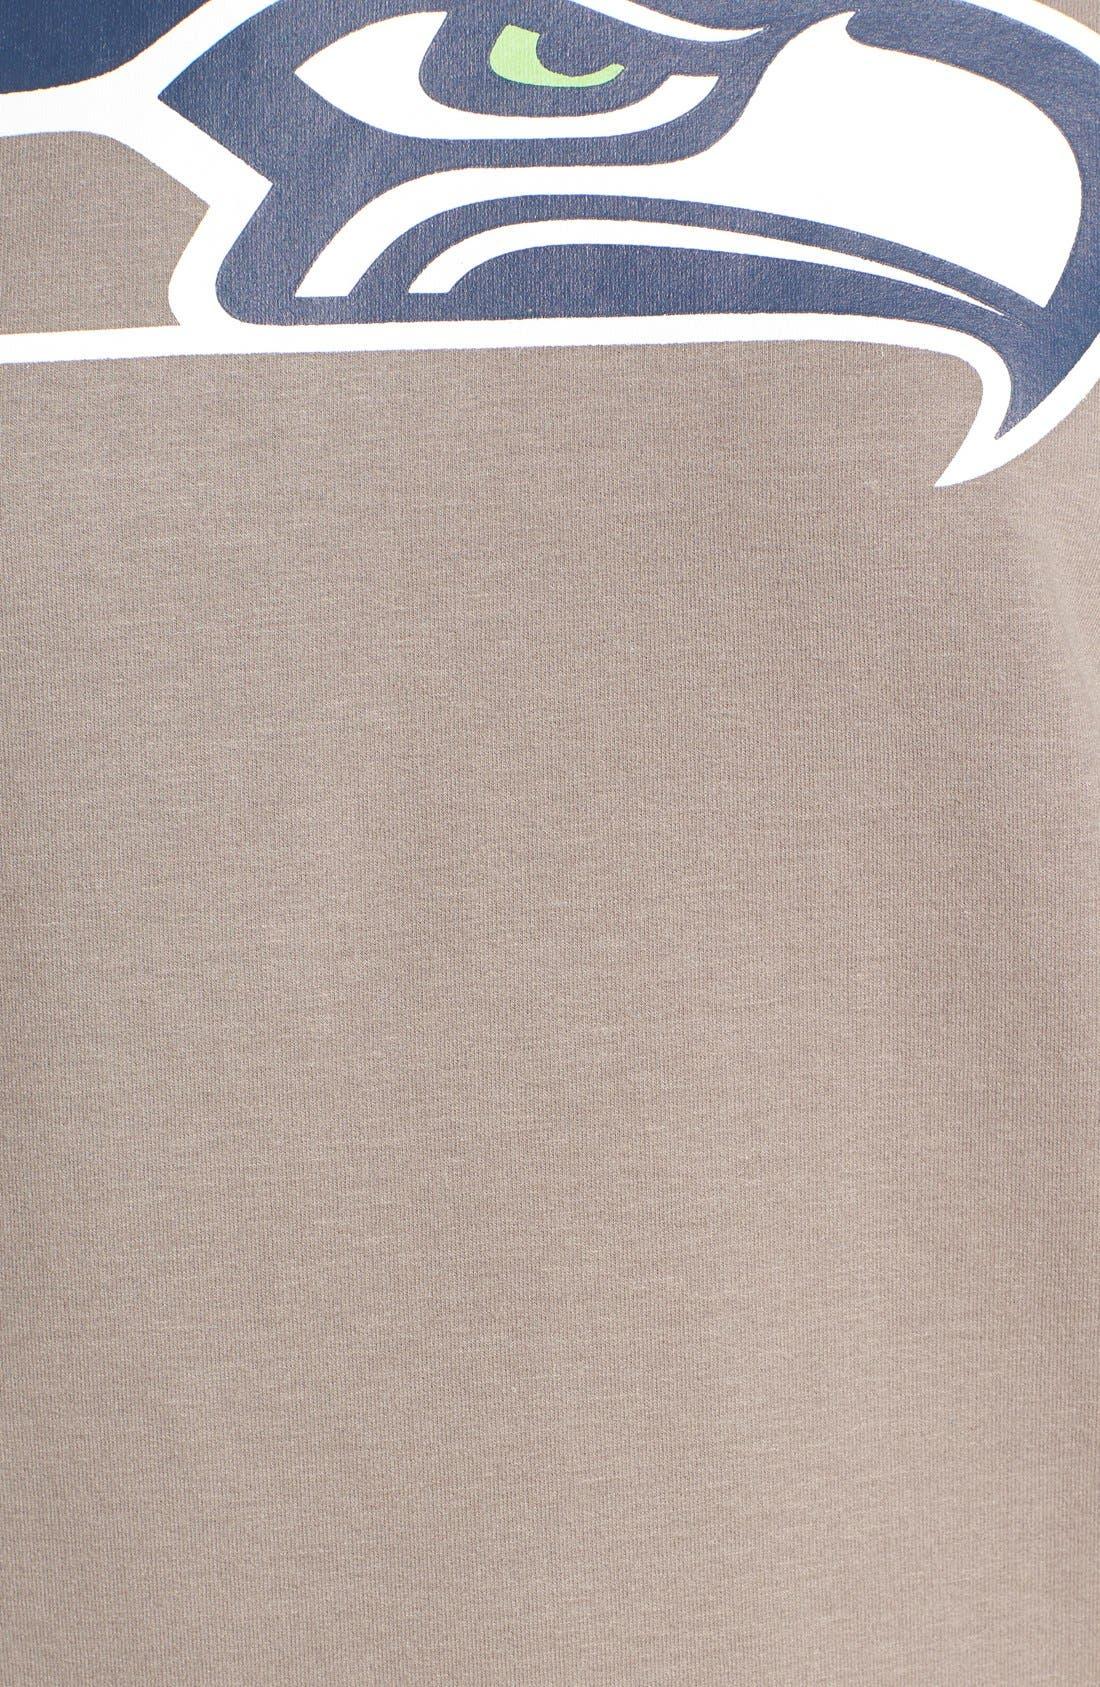 Alternate Image 5  - 47 Brand 'Seattle Seahawks' Graphic Sweatshirt